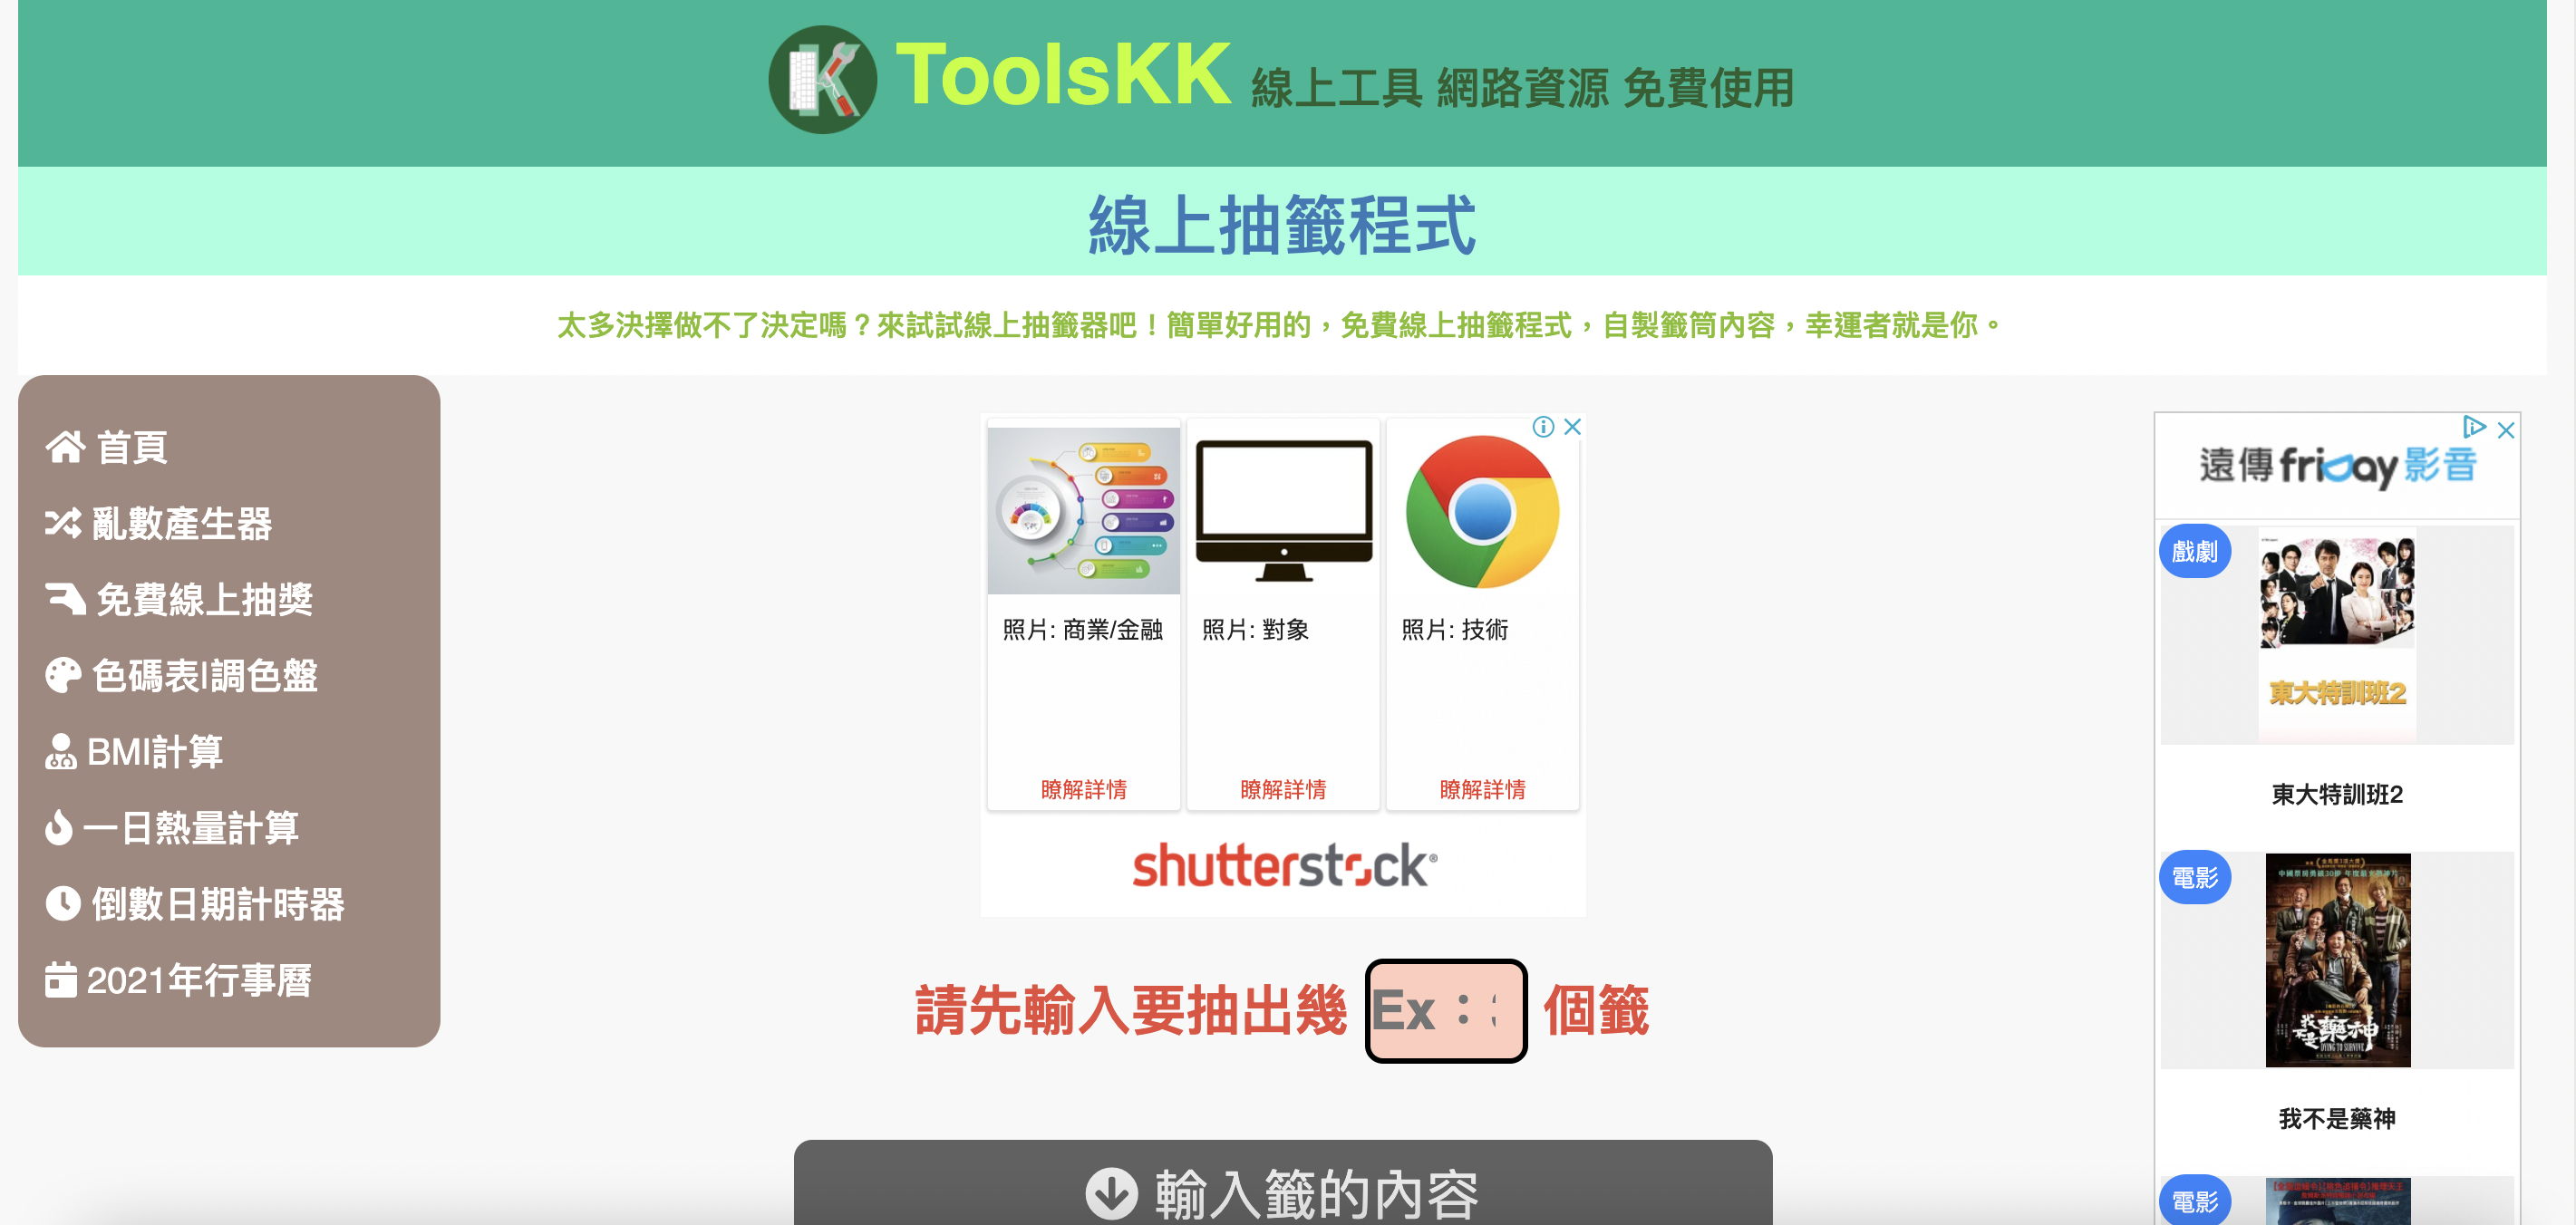 ToolsKK